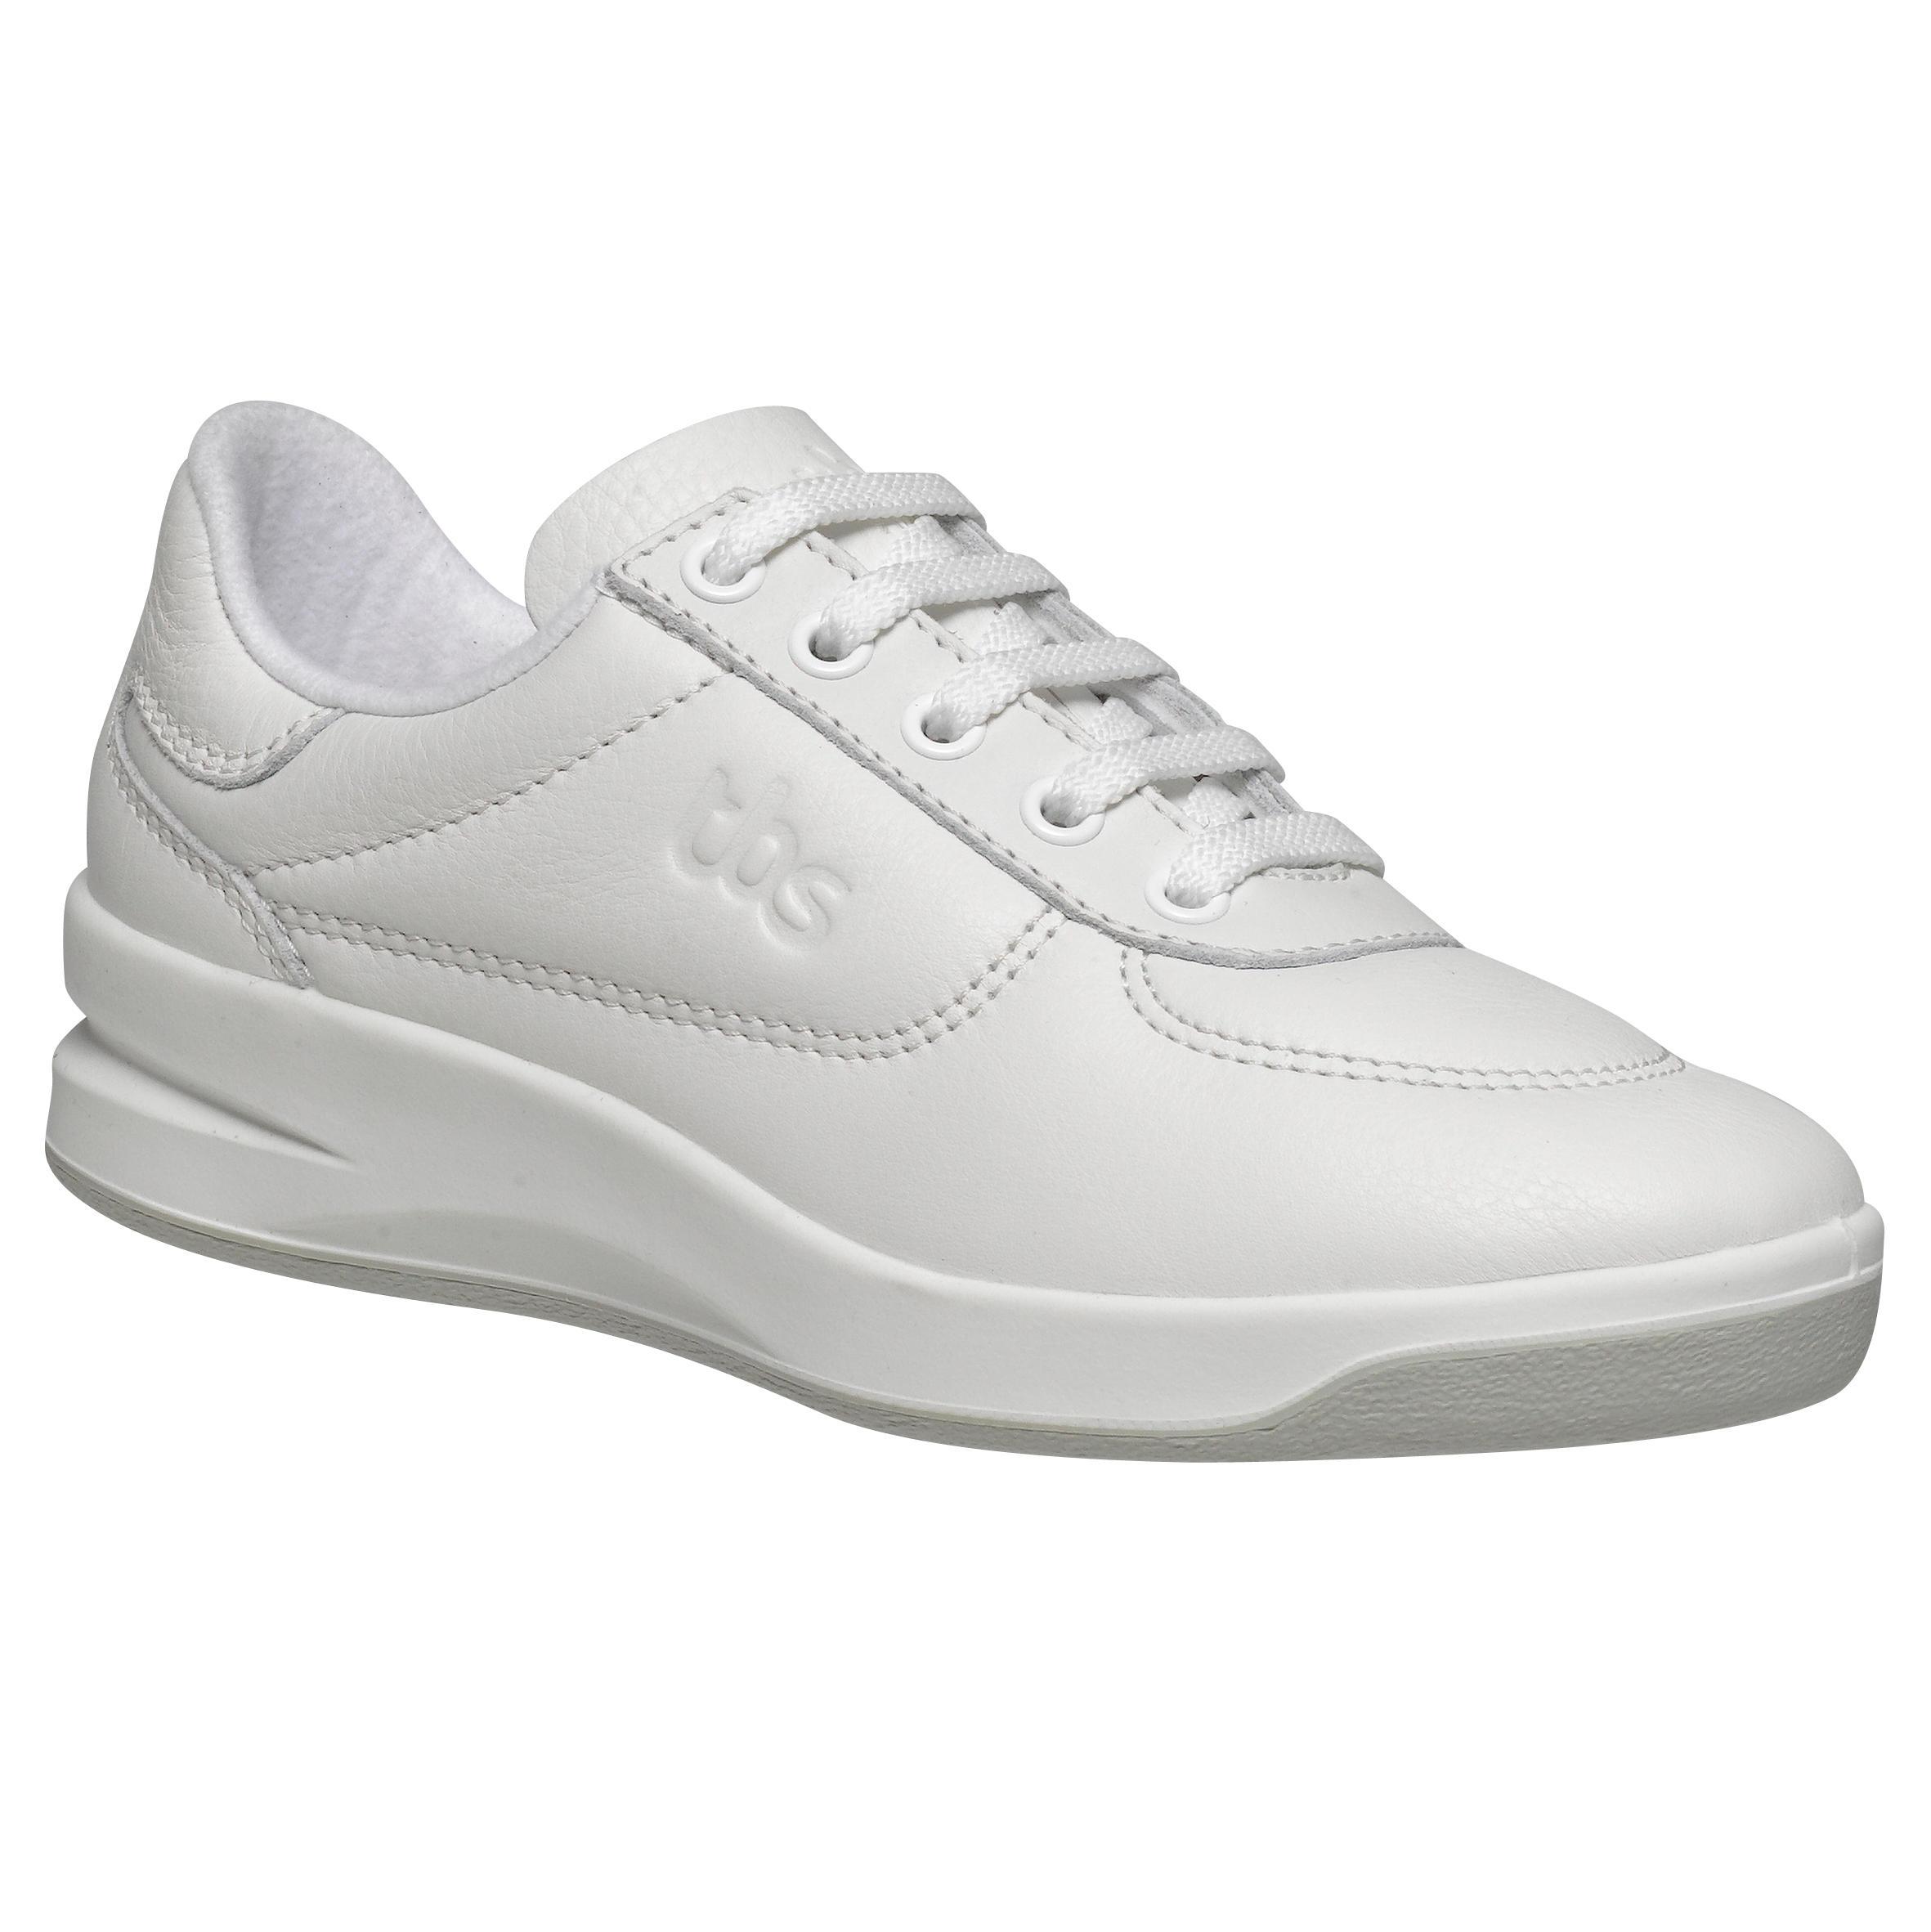 Tennisschoenen dames Brandy wit